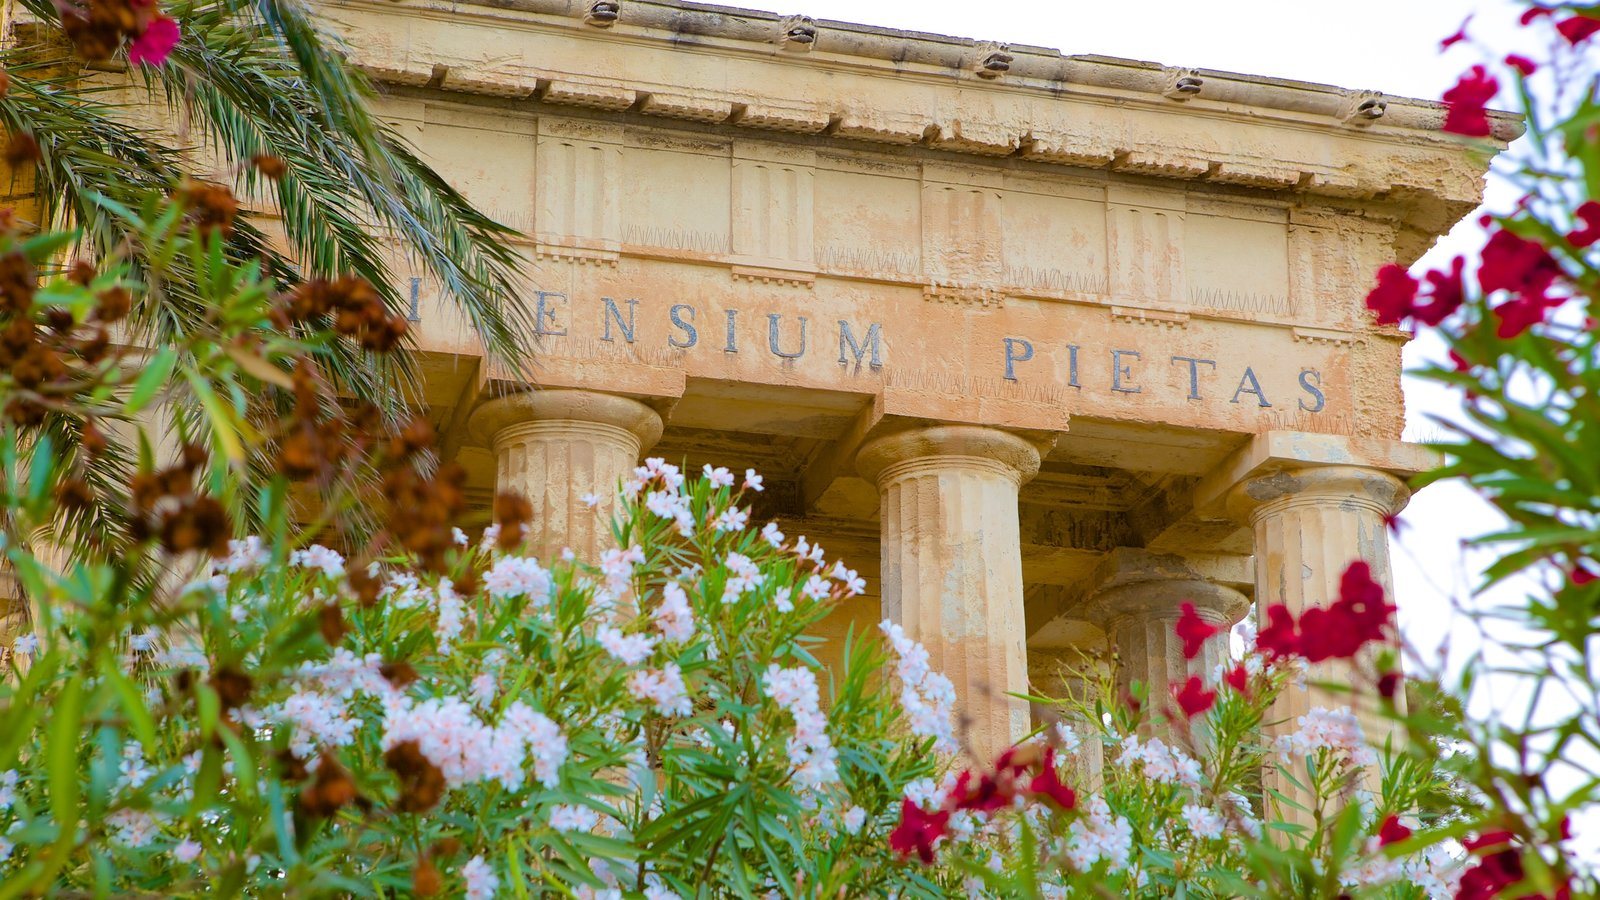 Jardins Inferiores de Barrakka caracterizando arquitetura de patrimônio e flores